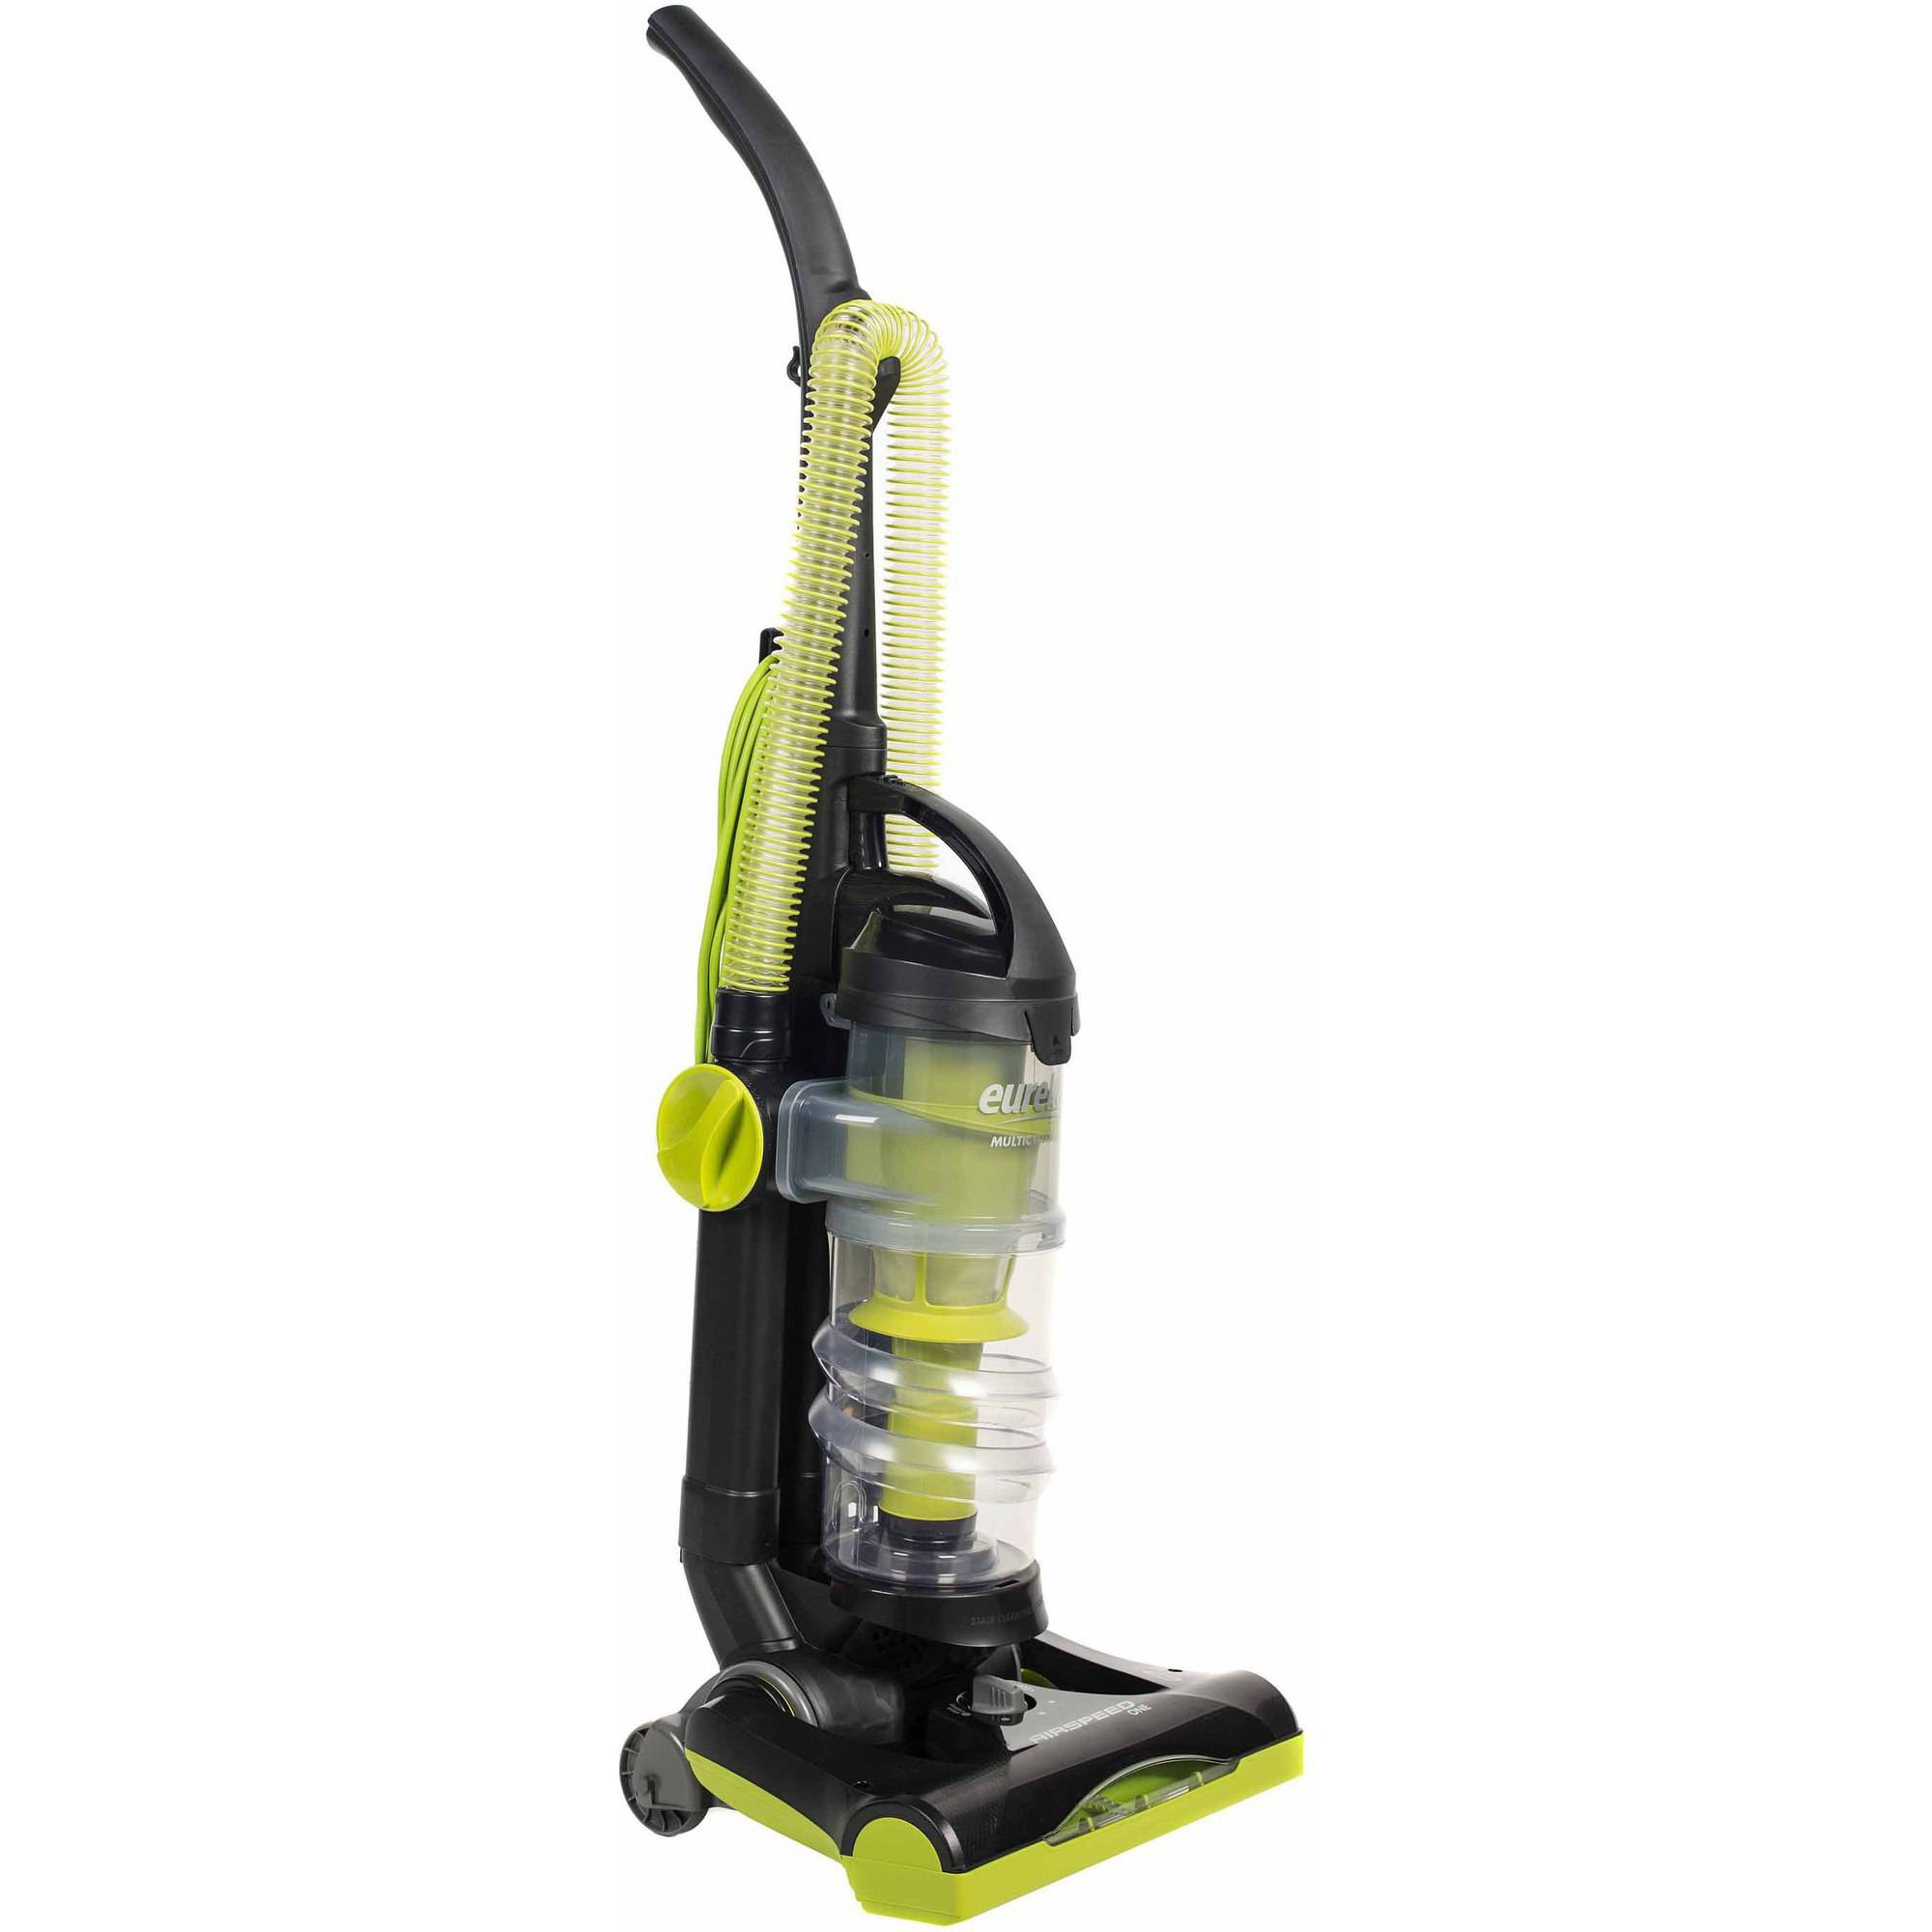 Eureka Upright Vacuum Cleaner Canister Bag Walmart Com